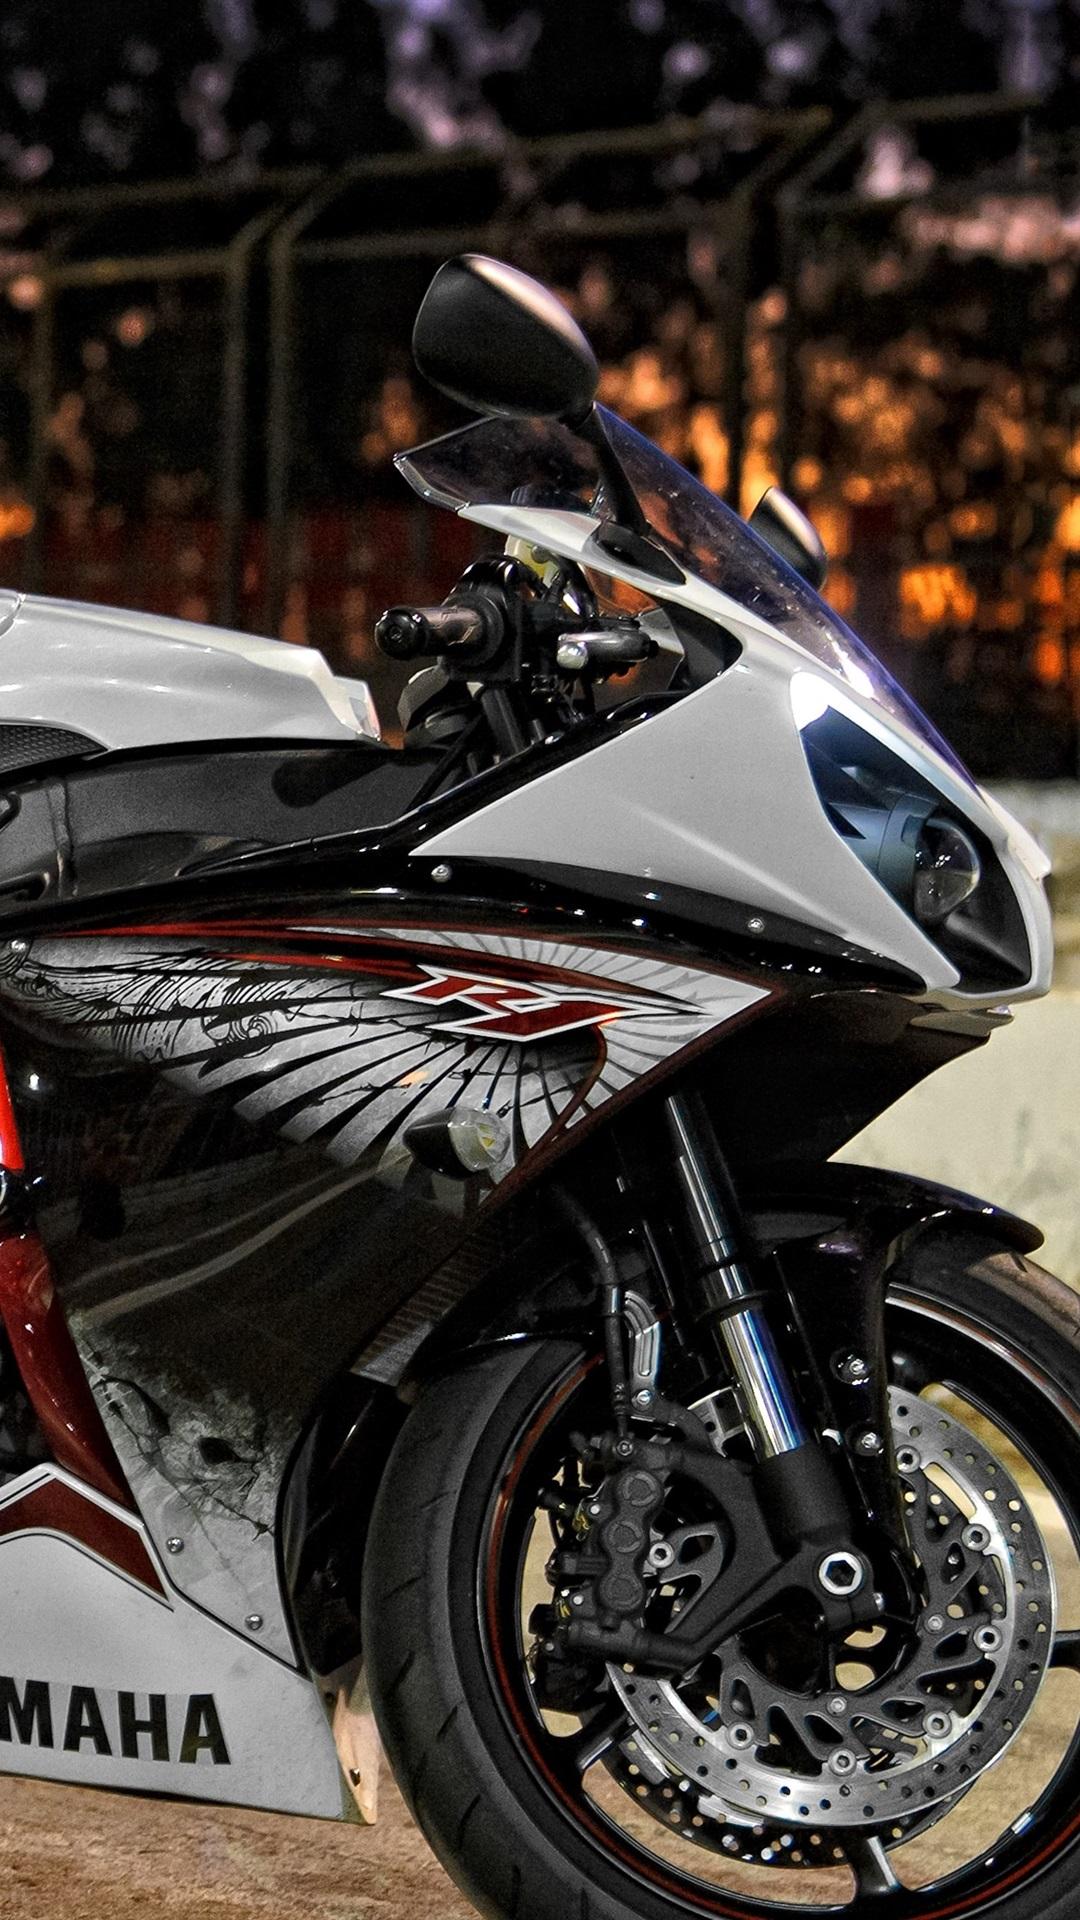 Yamaha Motorcycle At Night City Street 1080x1920 Iphone 8 7